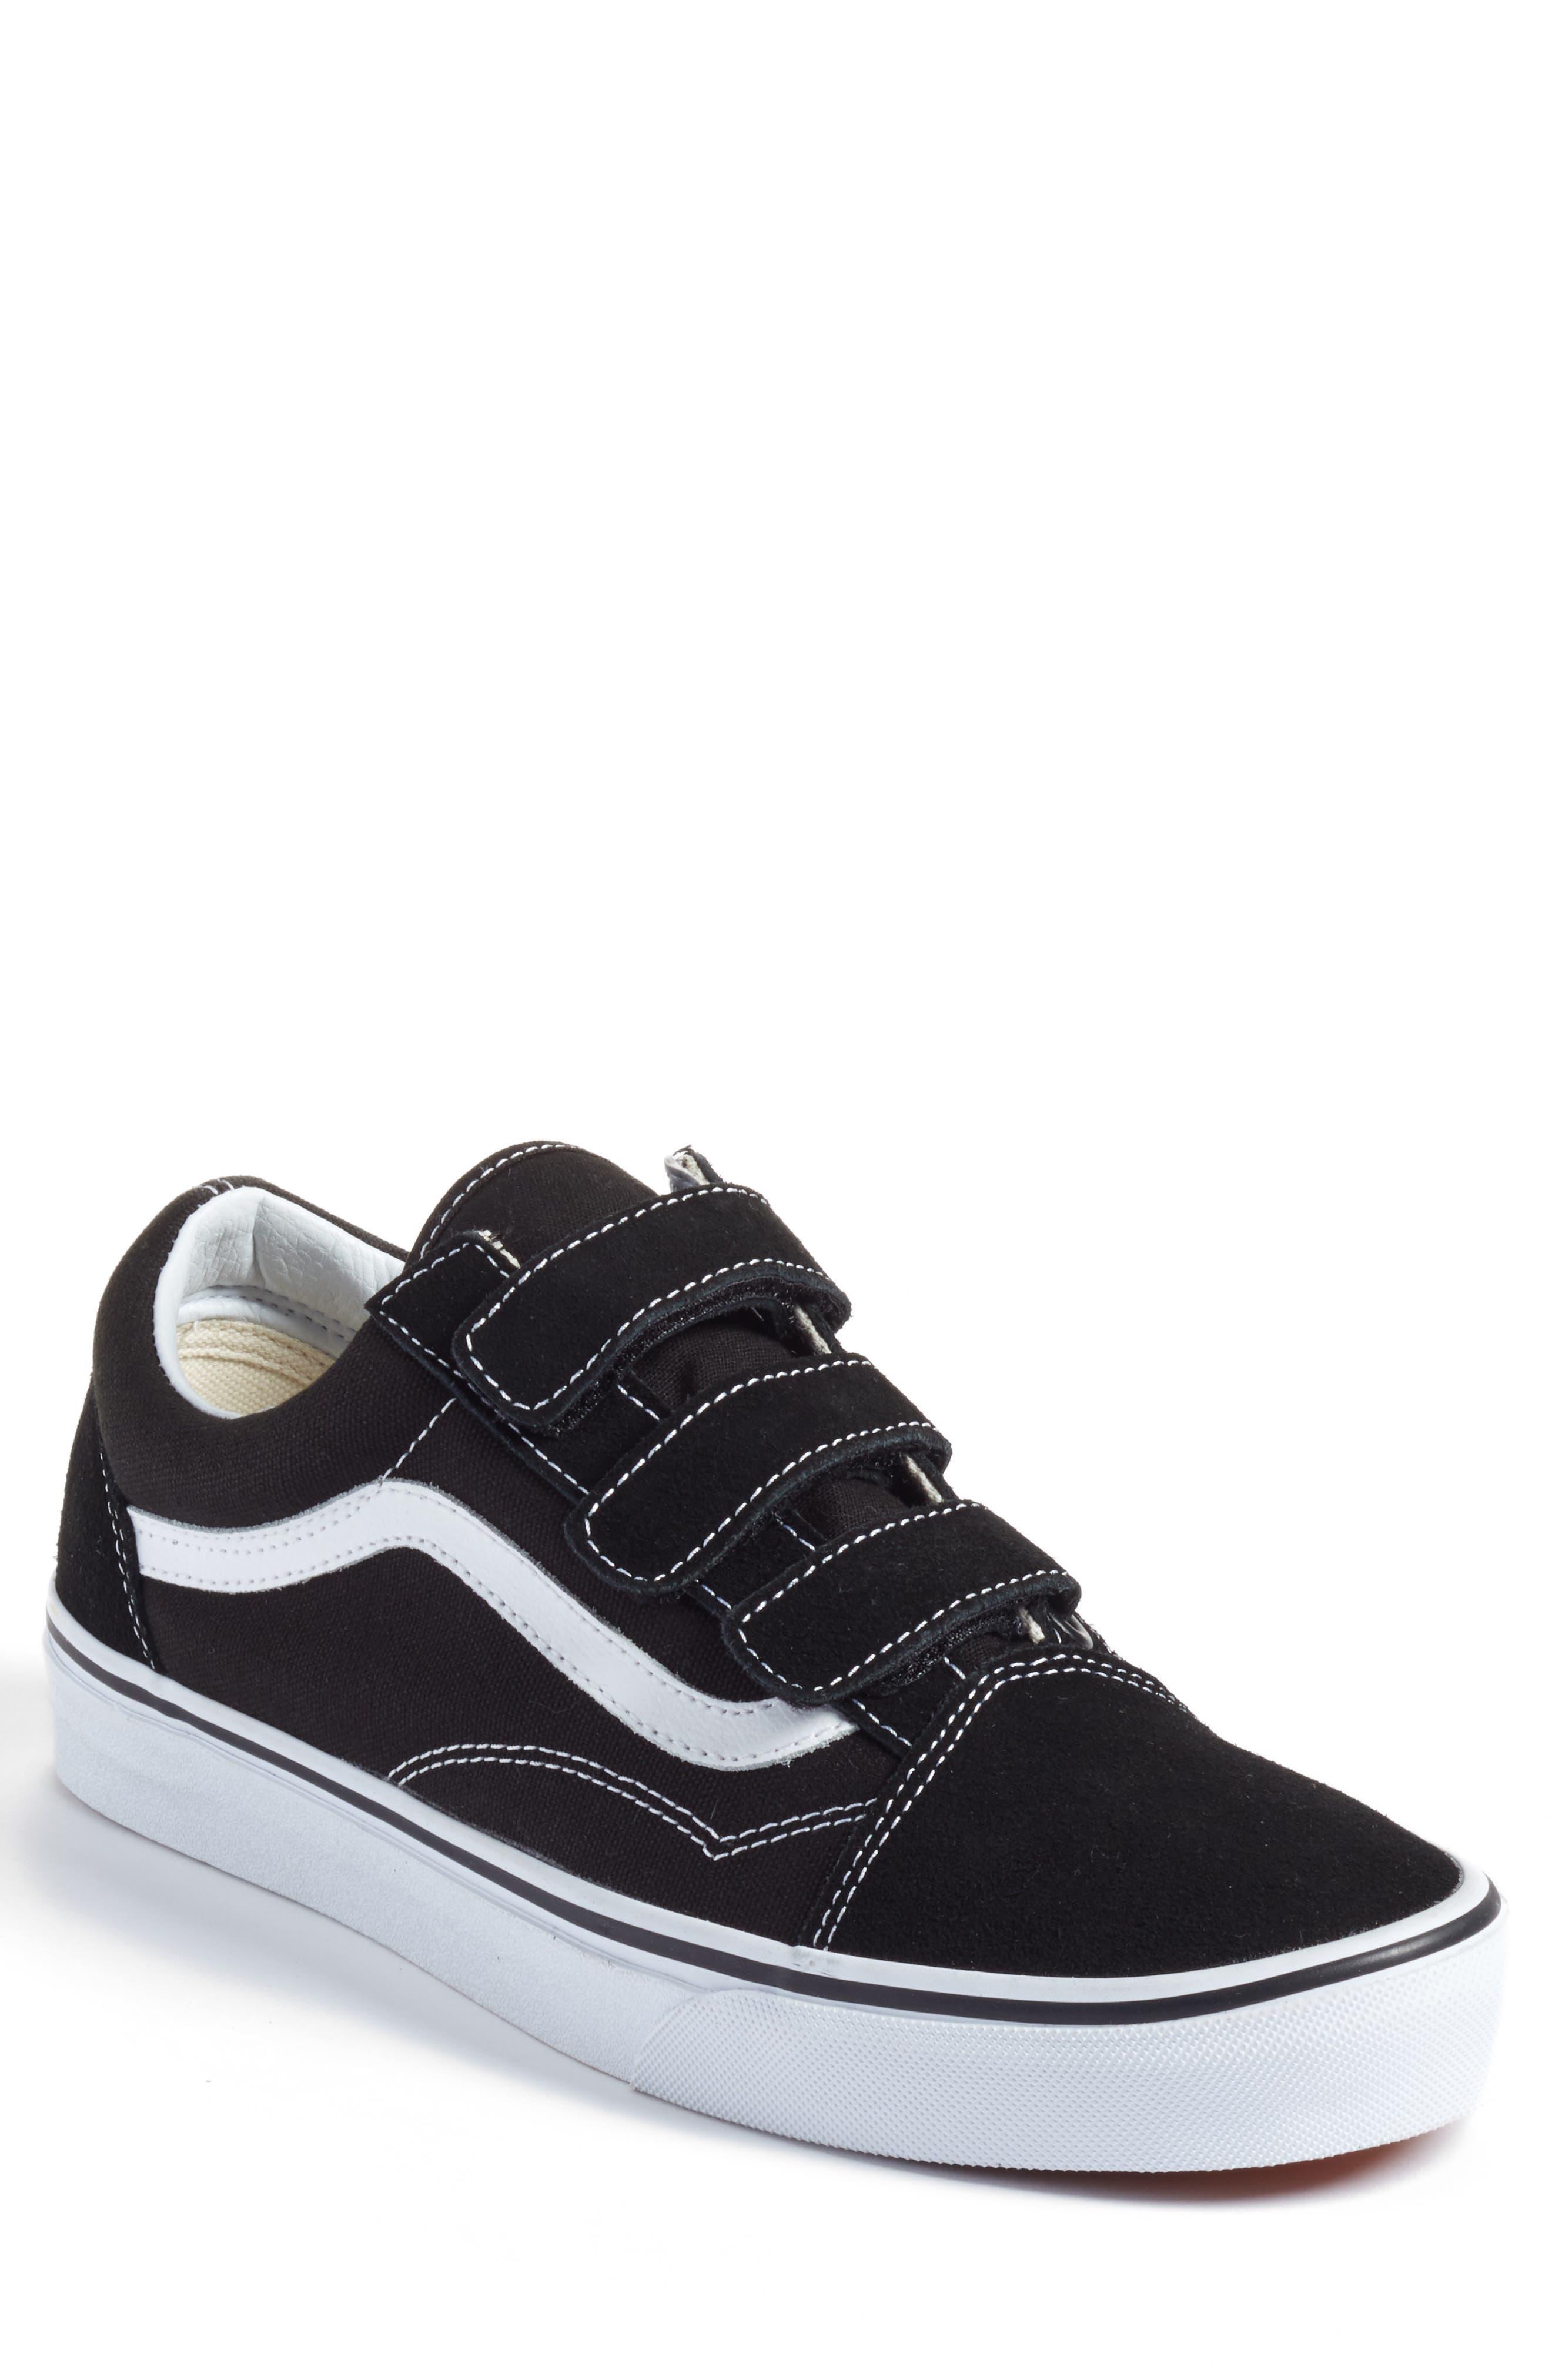 Alternate Image 1 Selected - Vans Old Skool V-Sneaker (Men)